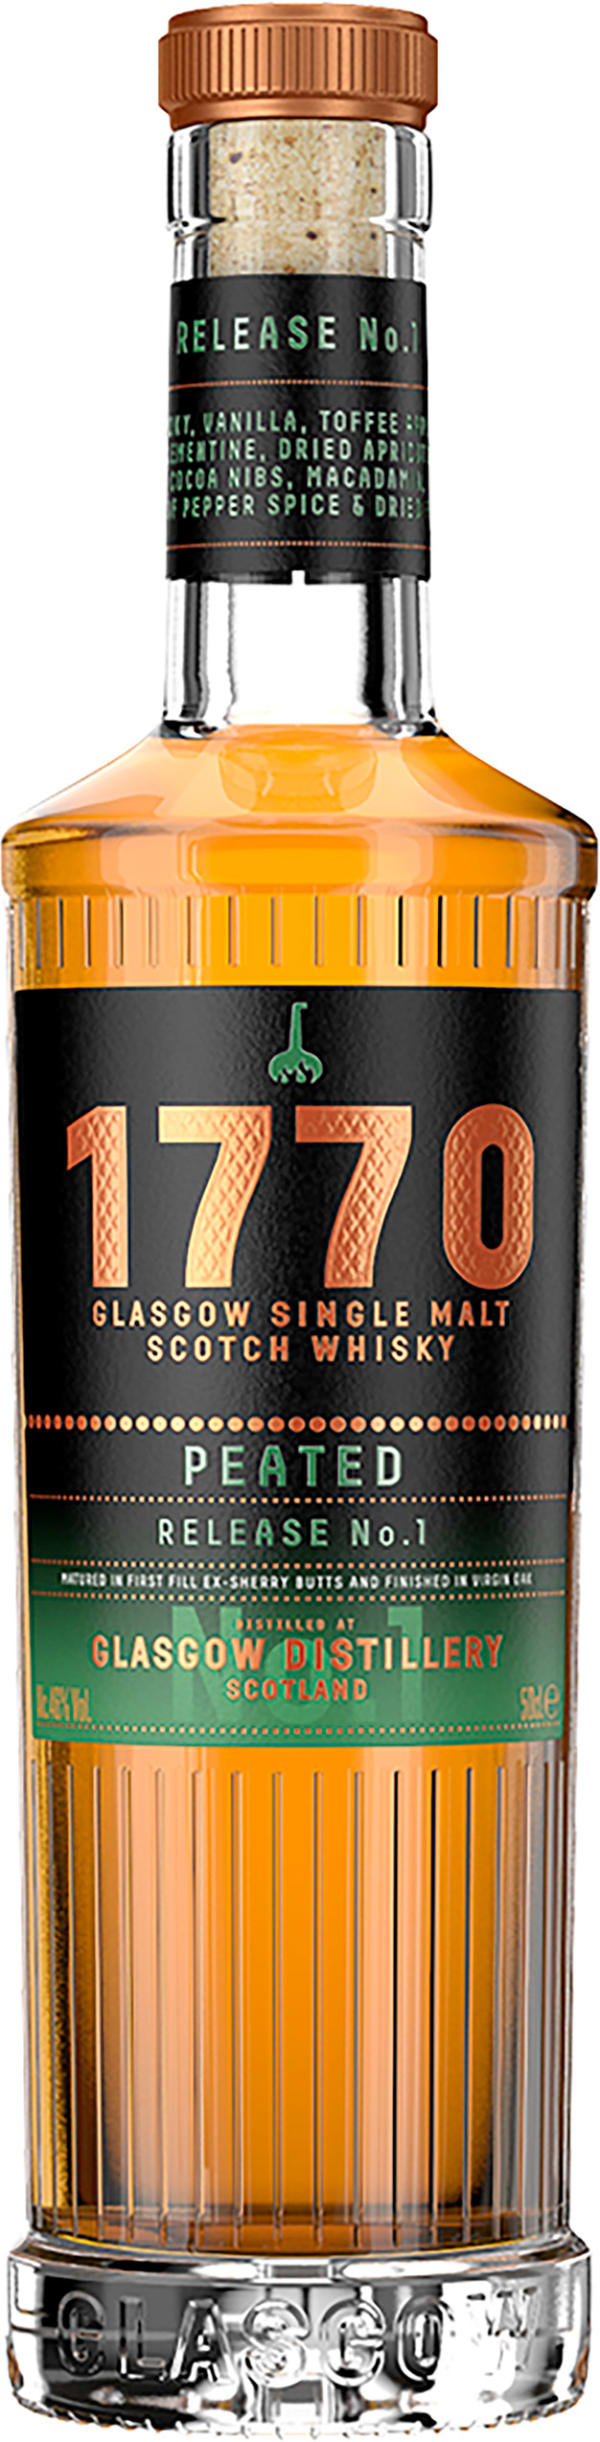 1770 Glasgow Peated Release No. 1 Single Malt